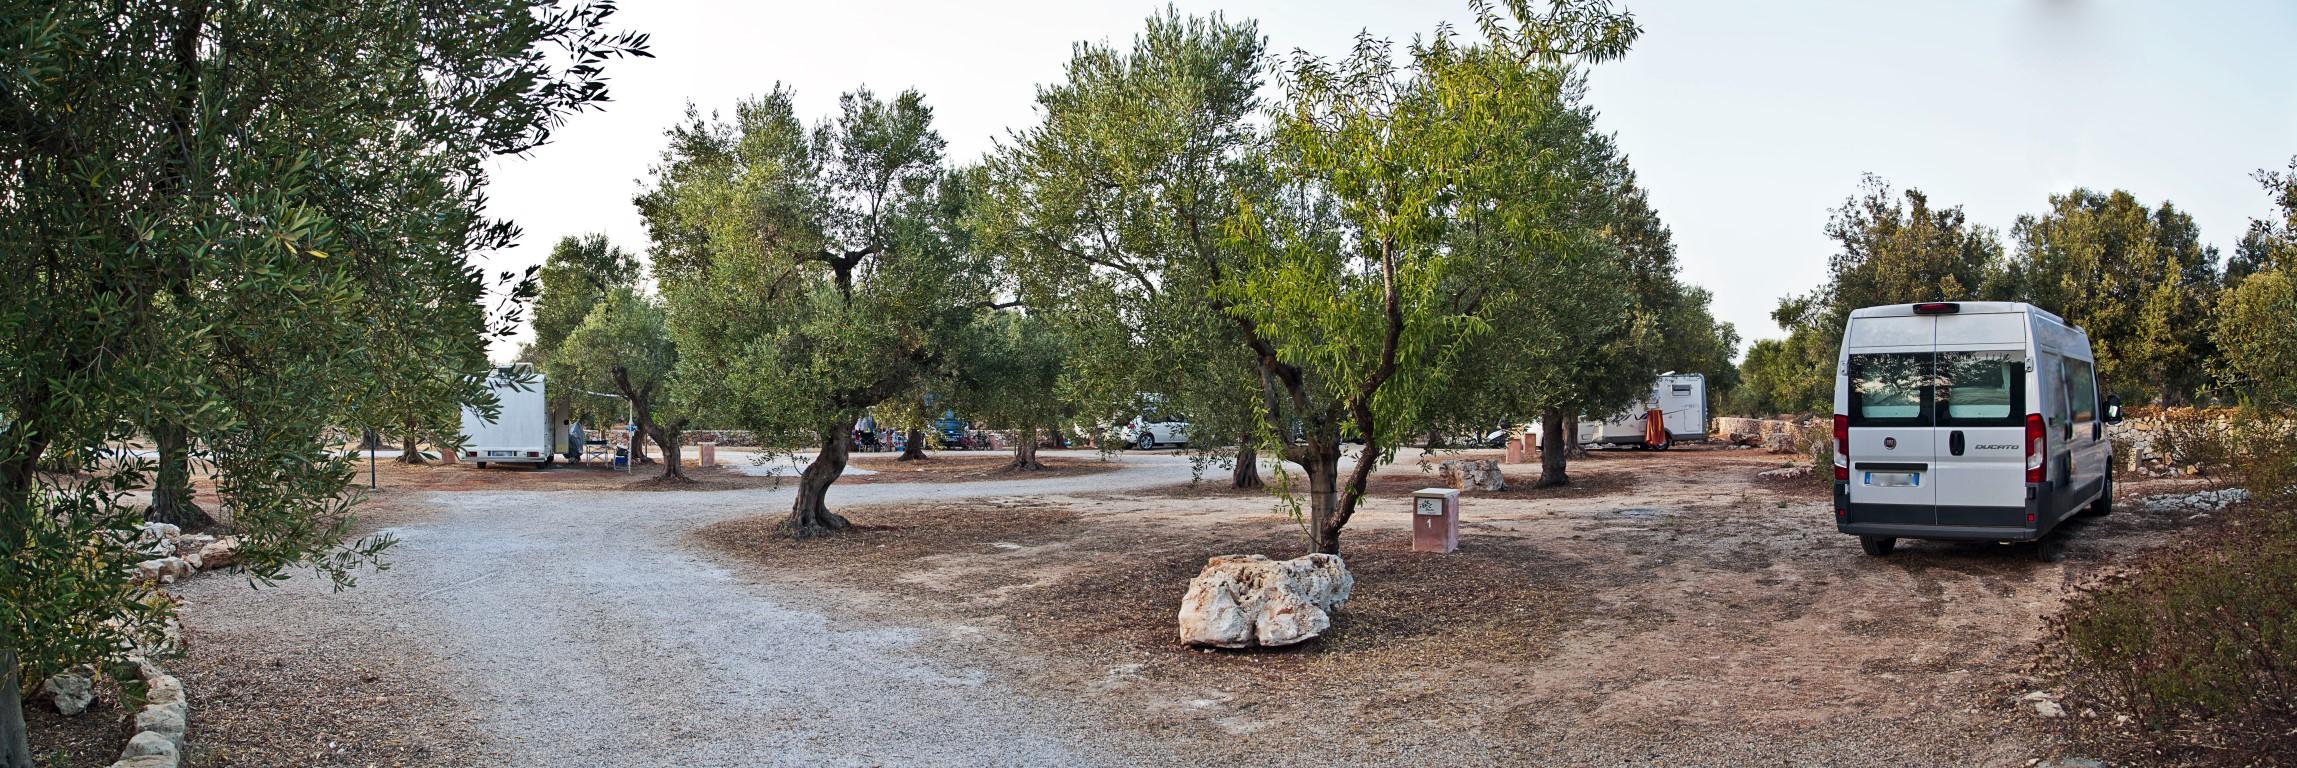 agricampeggio-salento-2017-6